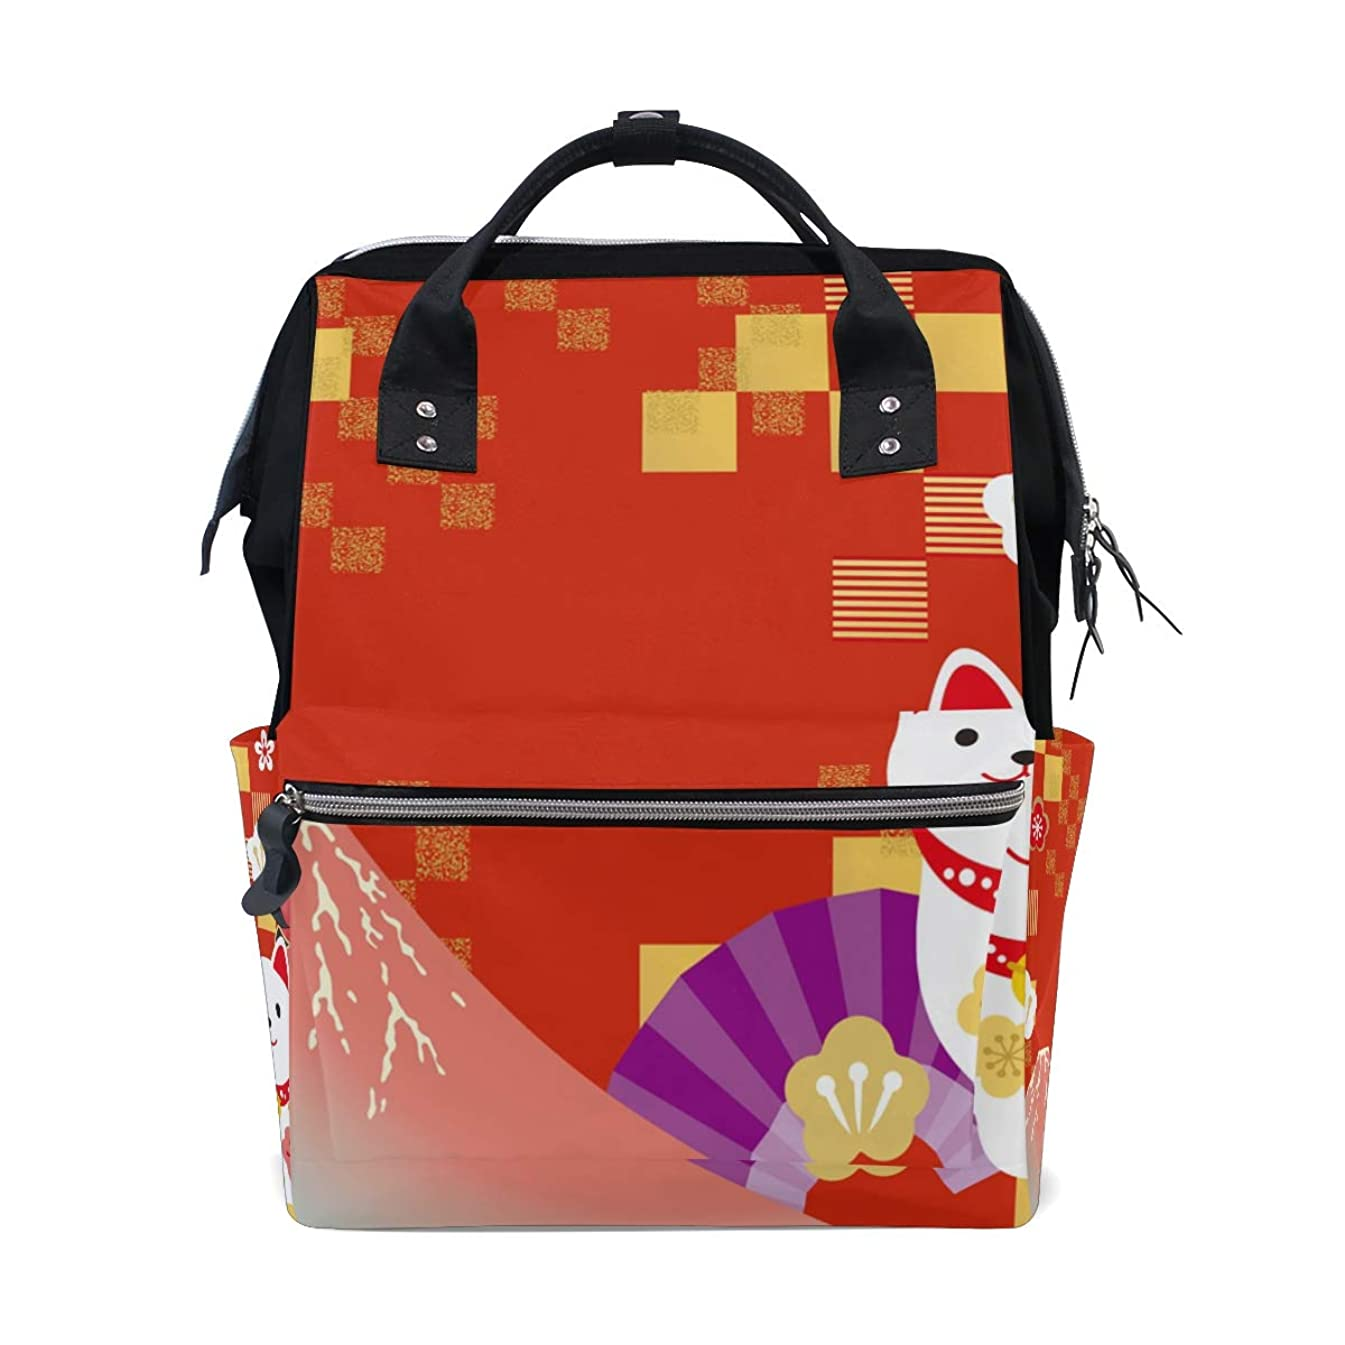 Red Japanese Cat Mount Fuji School Backpack Large Capacity Mummy Bags Laptop Handbag Casual Travel Rucksack Satchel For Women Men Adult Teen Children